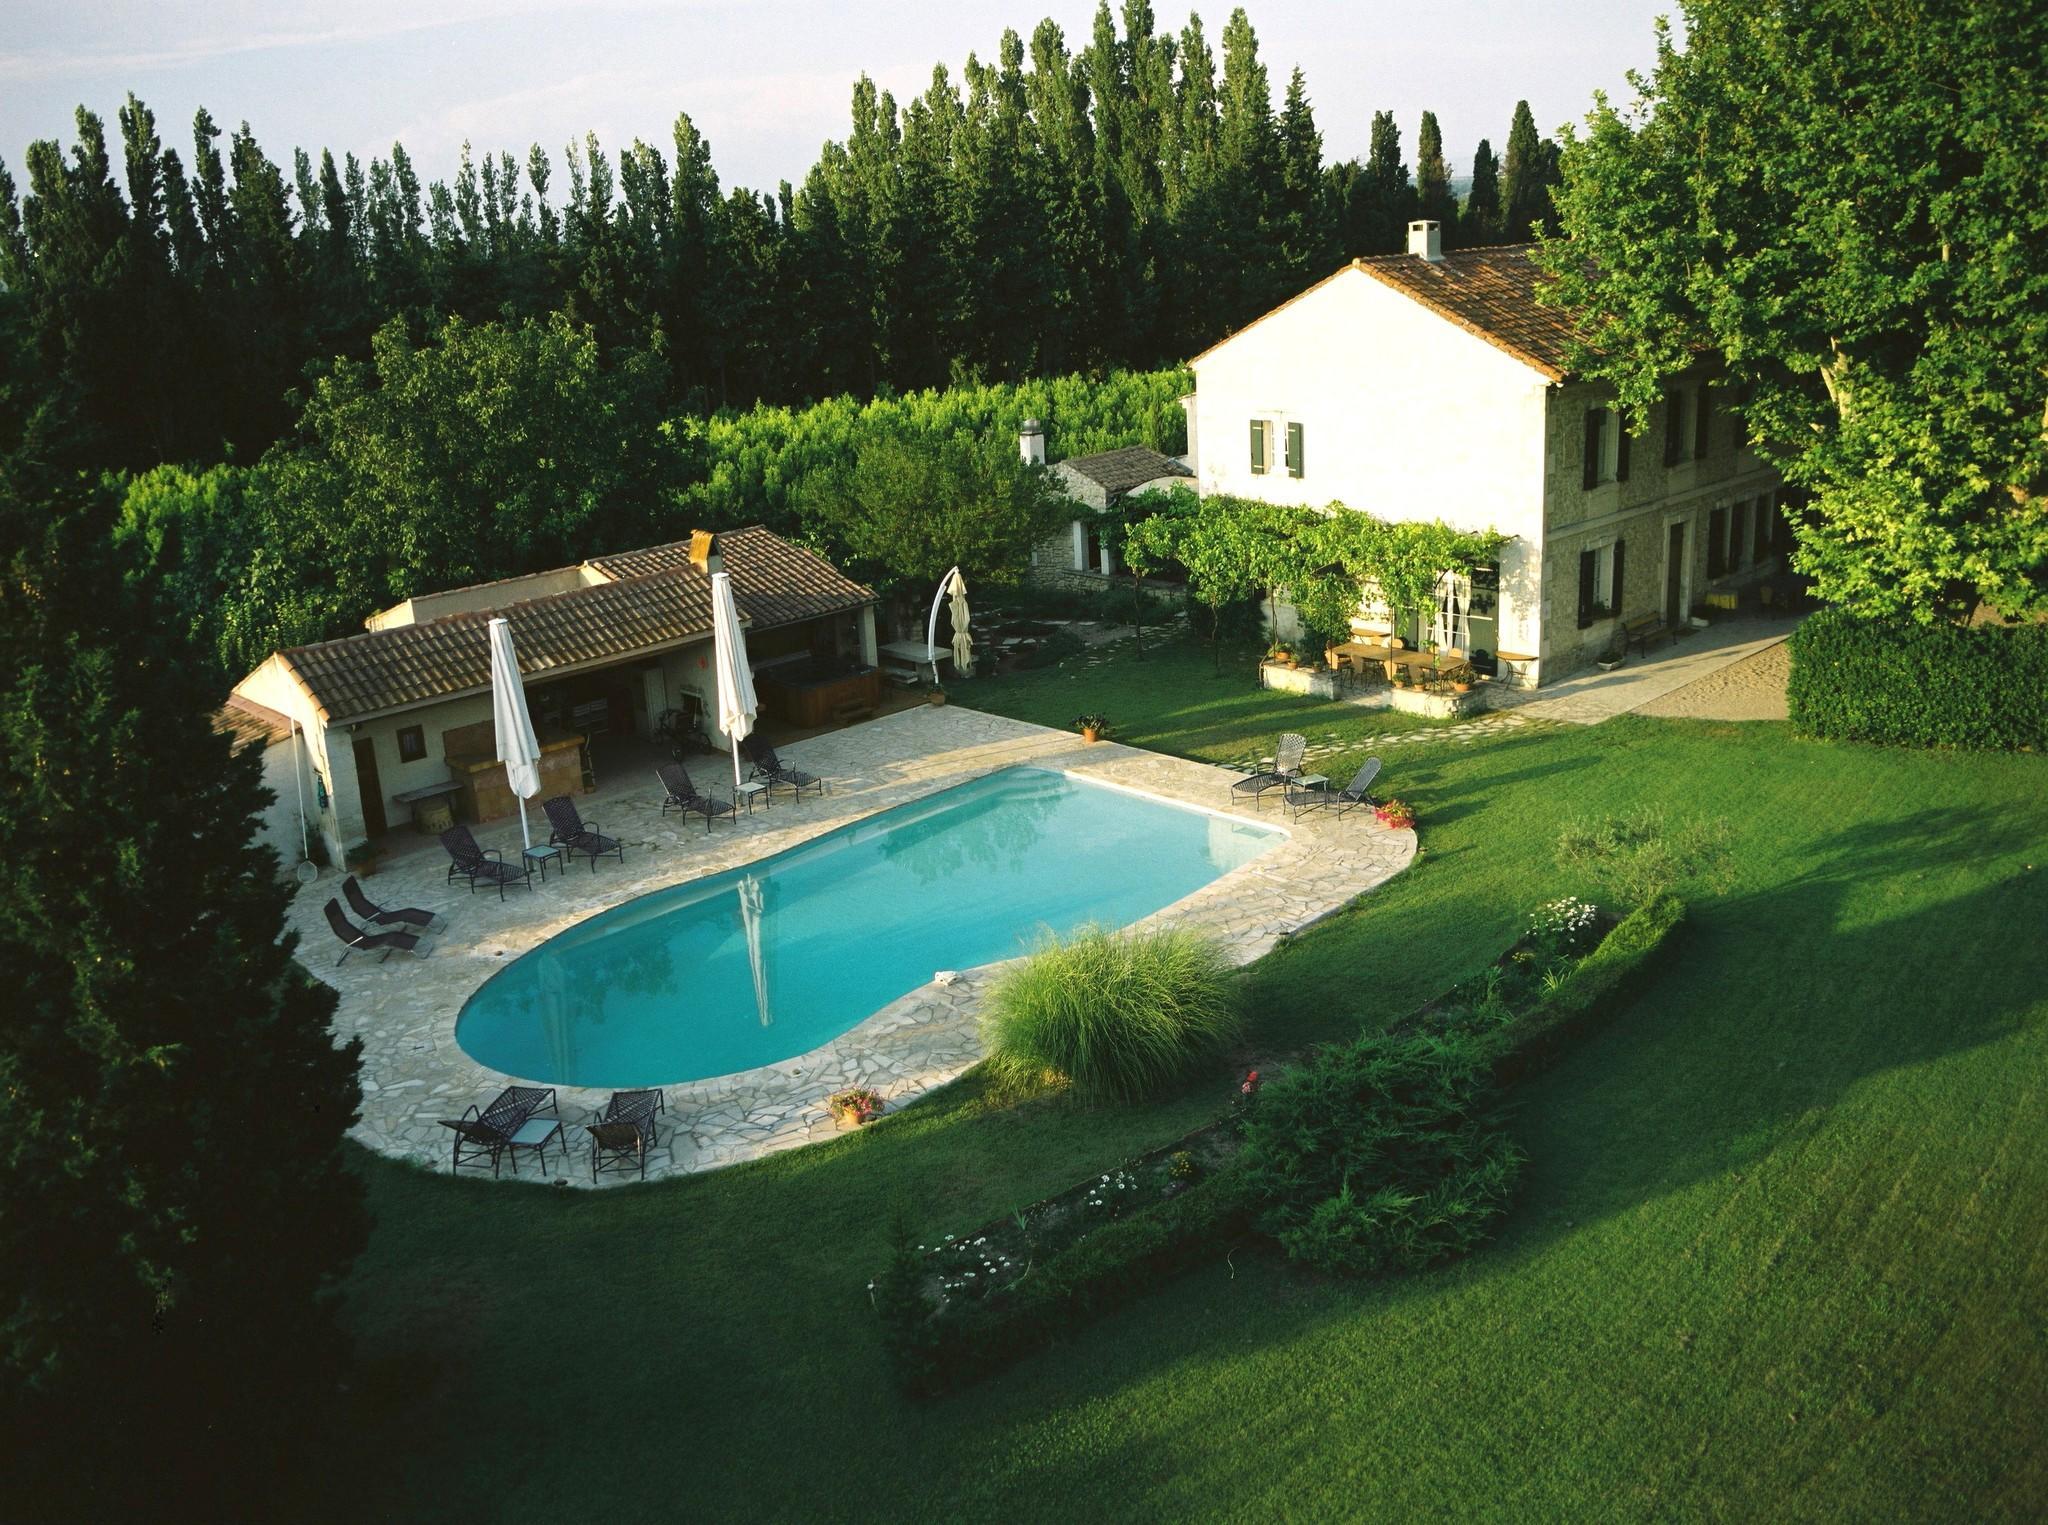 Tour participants will spend seven nights at Mas de Cornud, a restored farmhouse in Saint Remy-de-Provence, France.